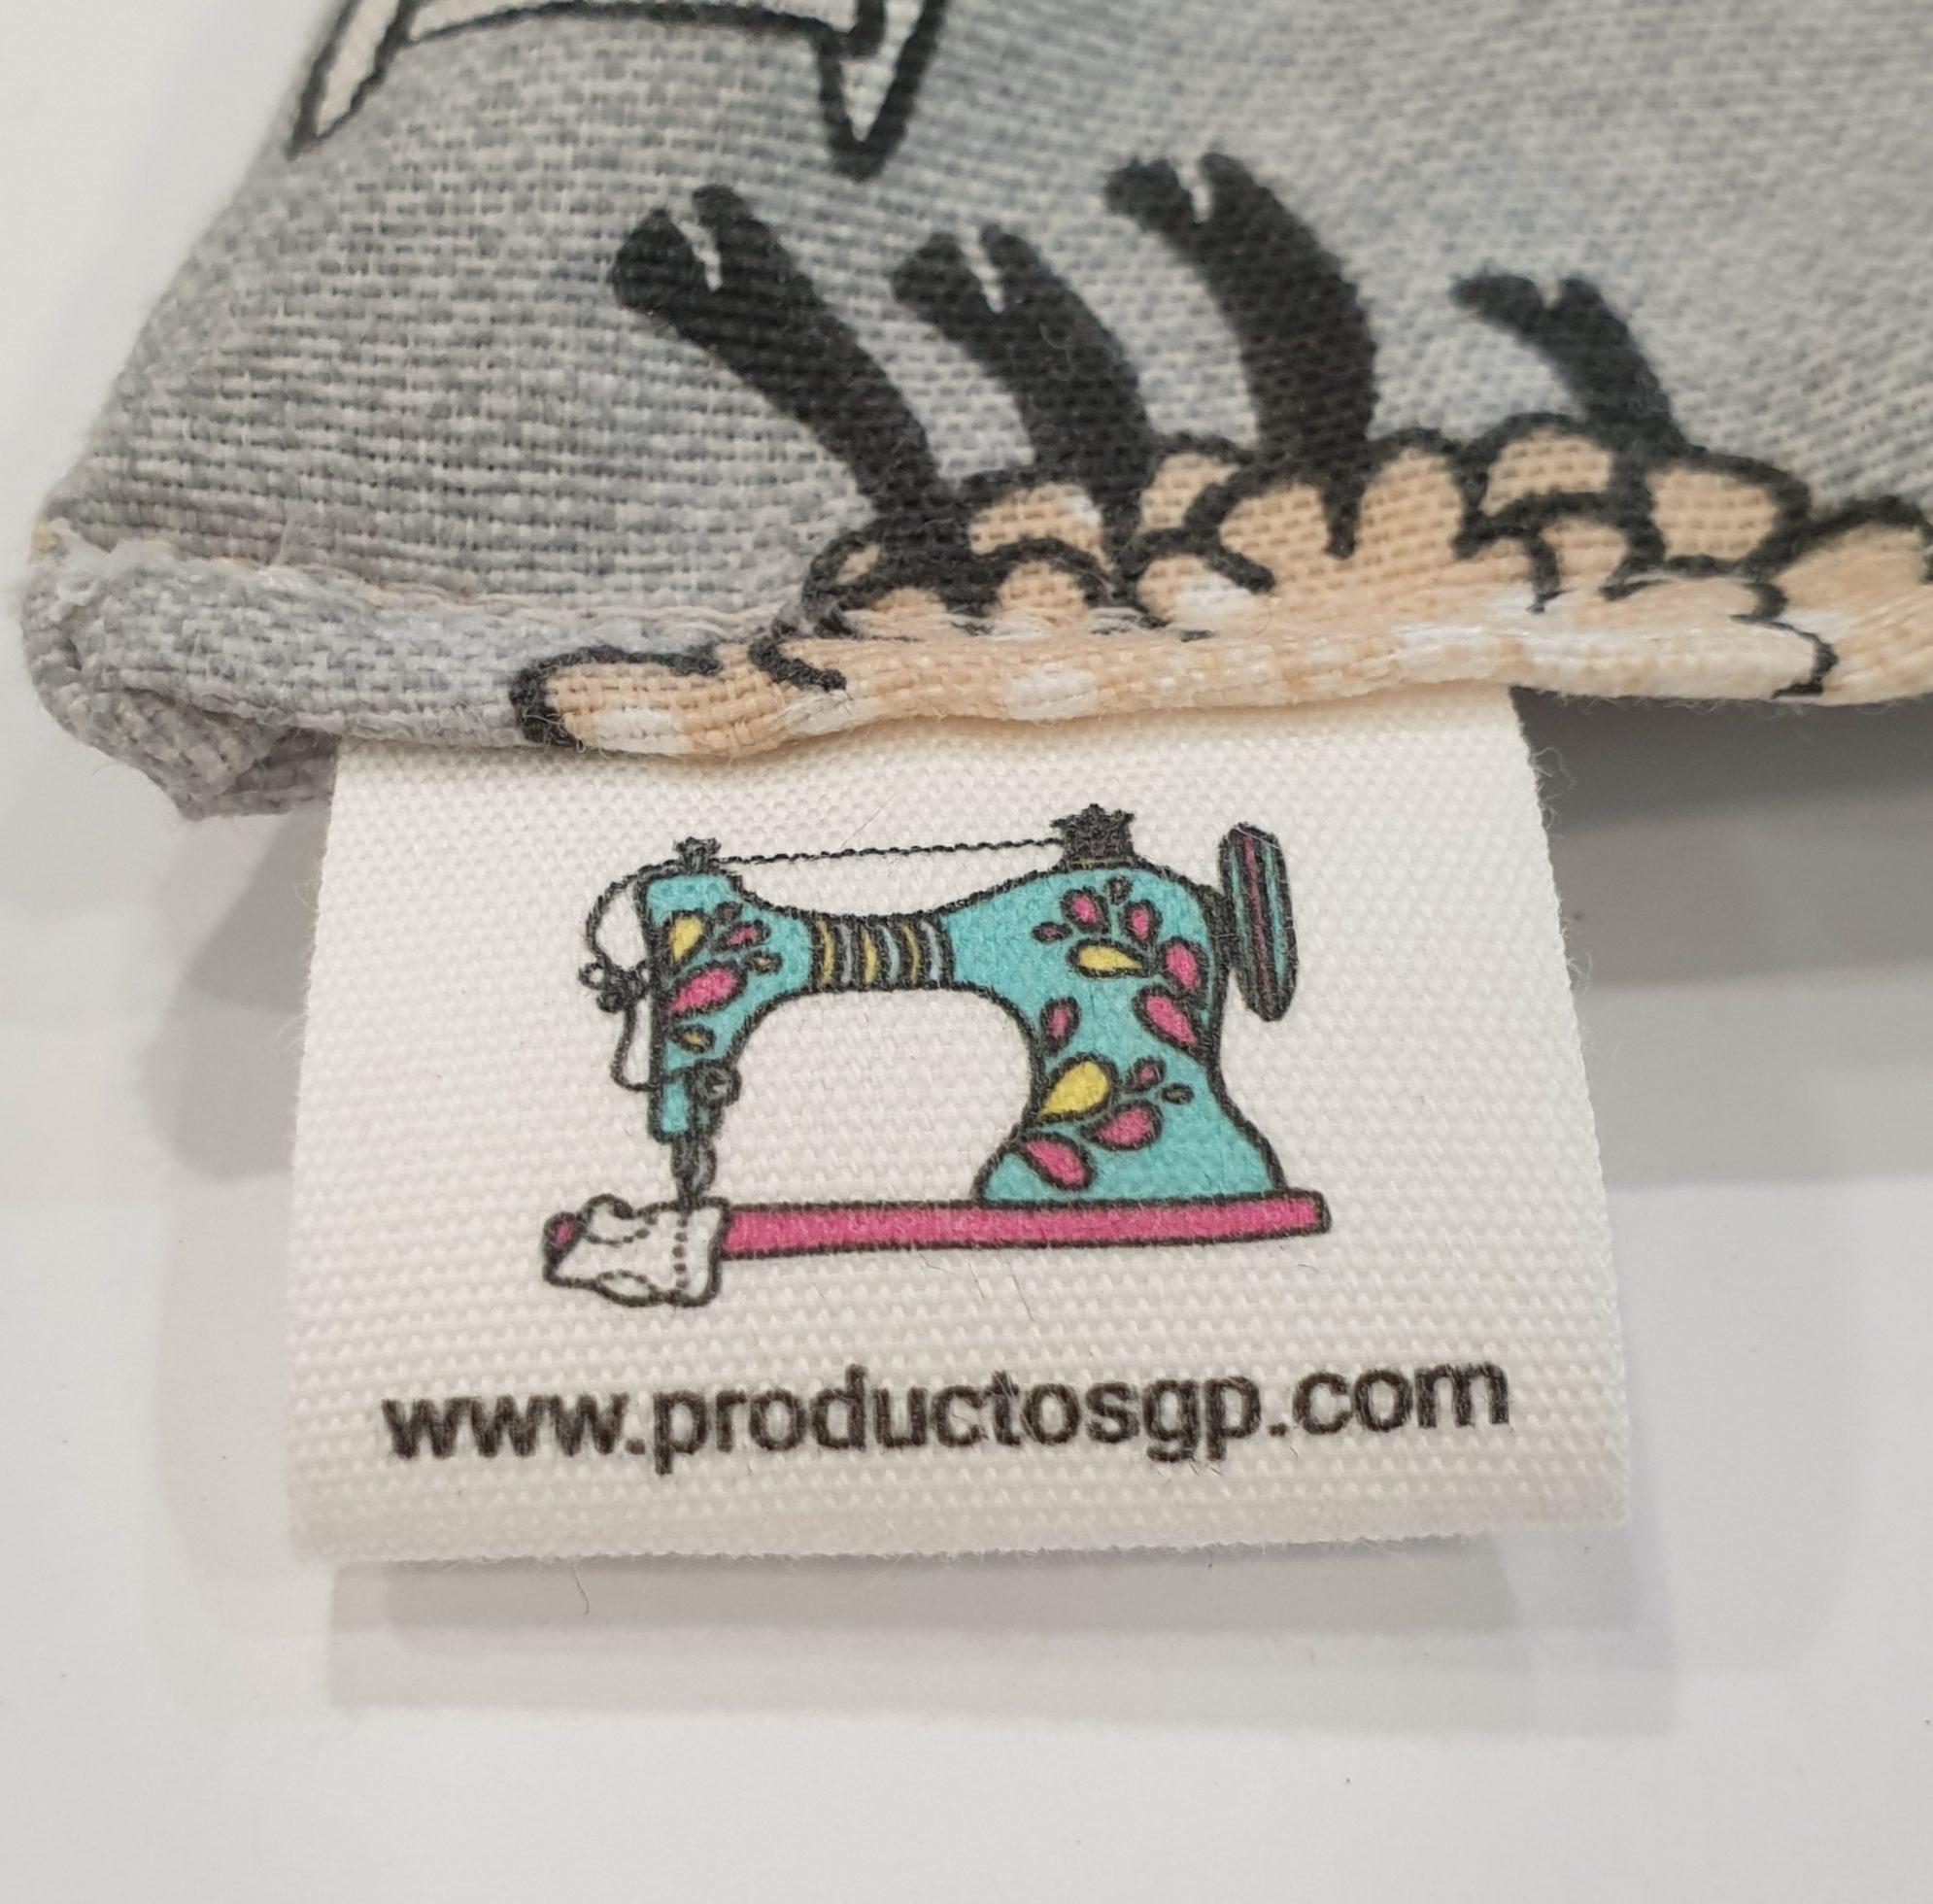 saco-térmico-productosgp (2)